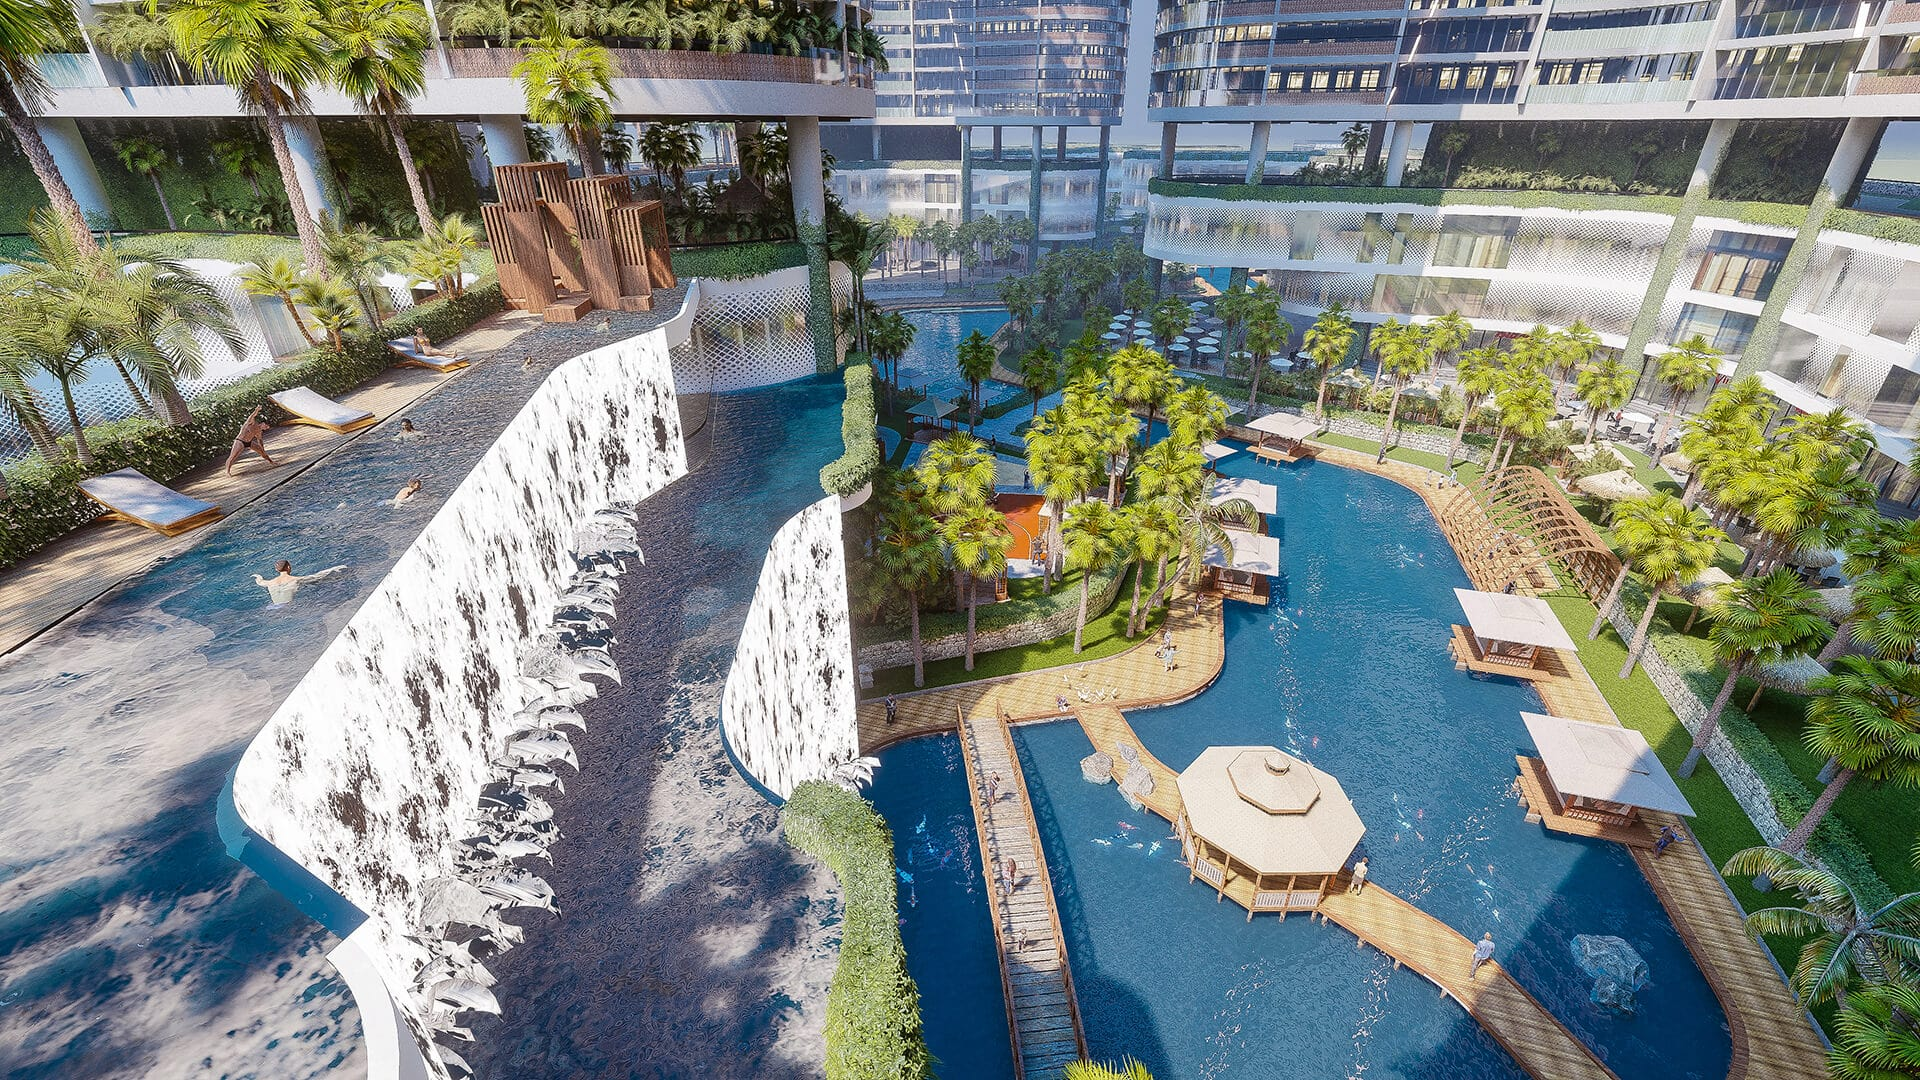 sunshine-diamond-river-phong-cach-chuan-resort-5-sao